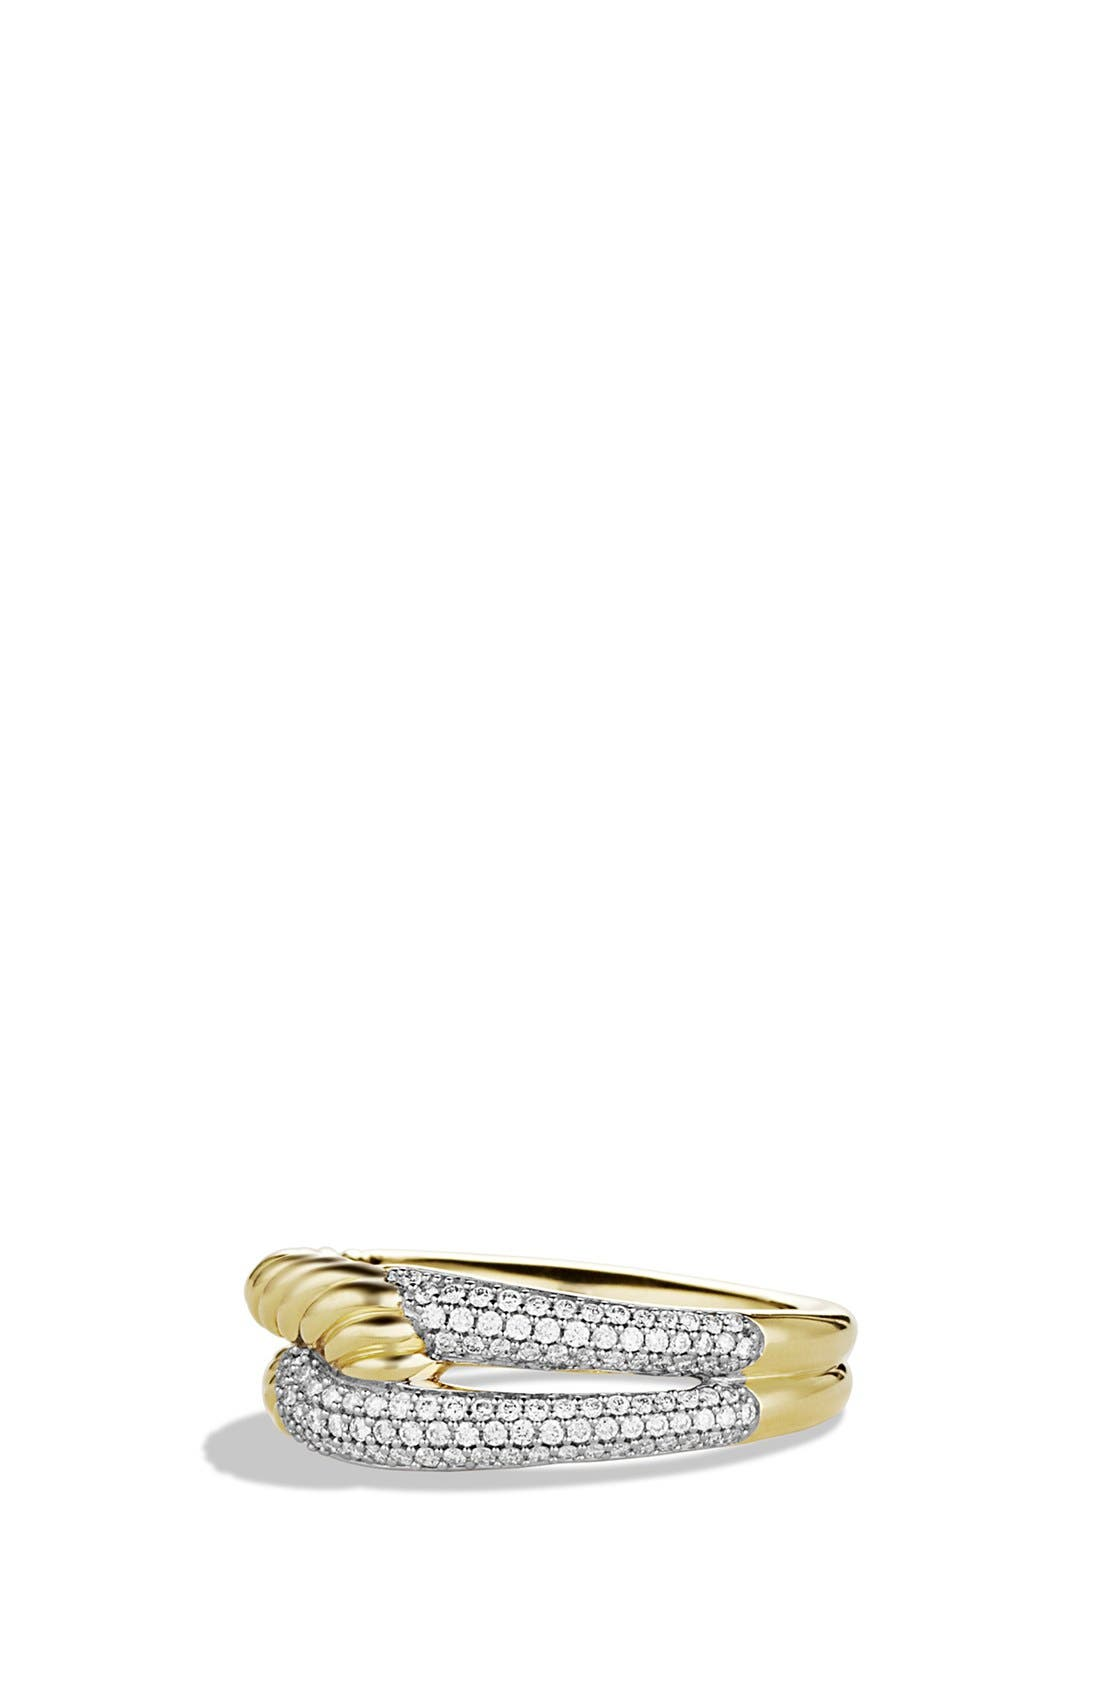 DAVID YURMAN Labyrinth Single Loop Ring with Diamonds in Gold